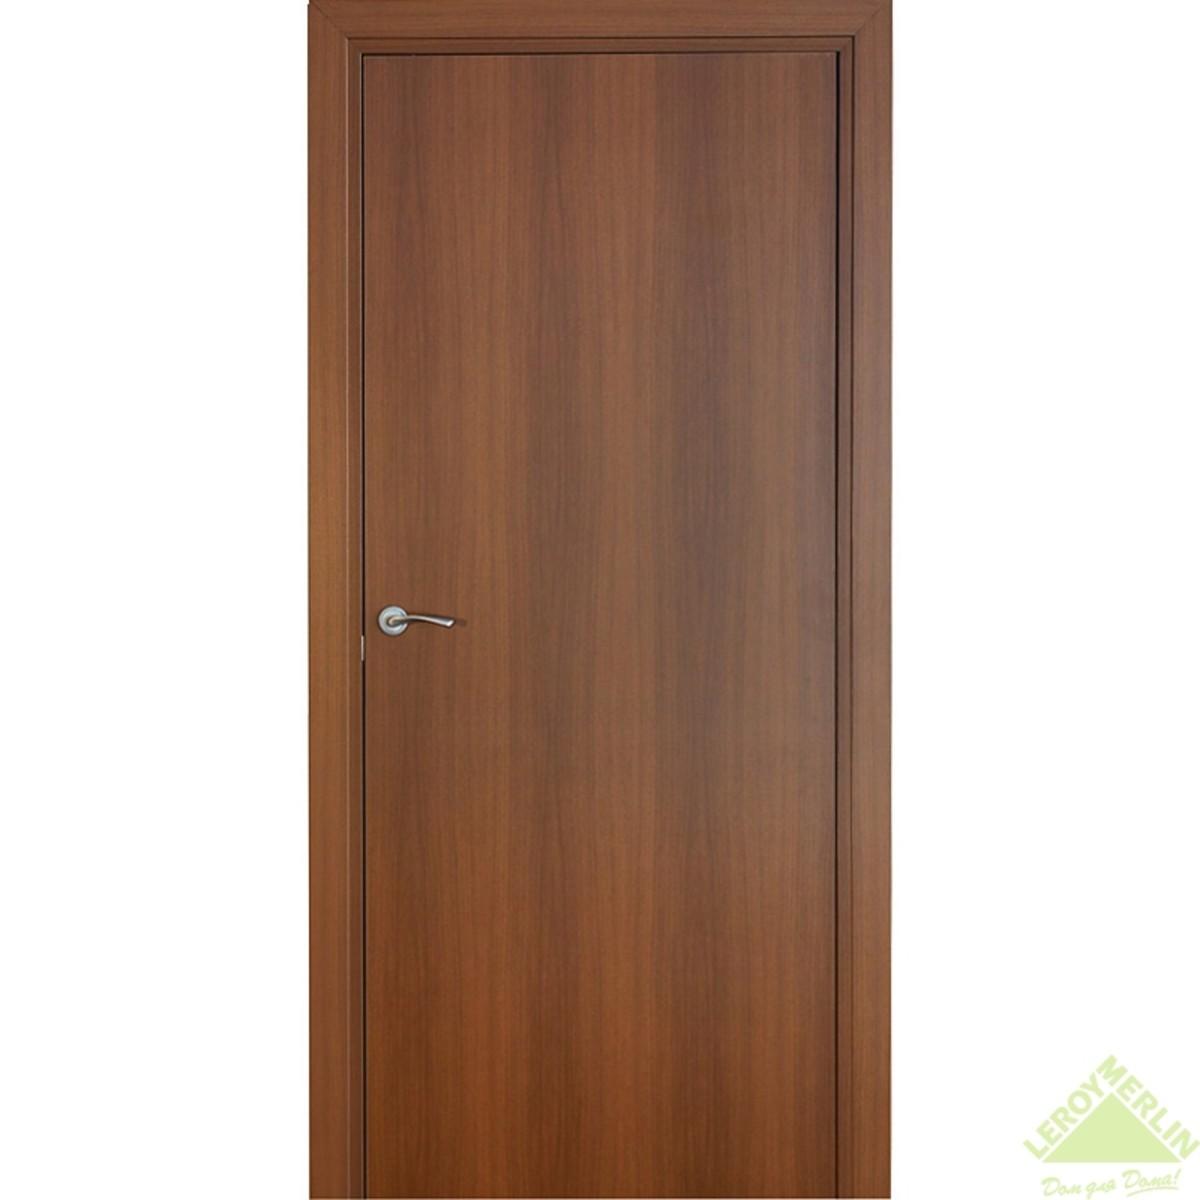 Дверь Межкомнатная Глухая Фортунато 90x200 Ламинация Цвет Орех